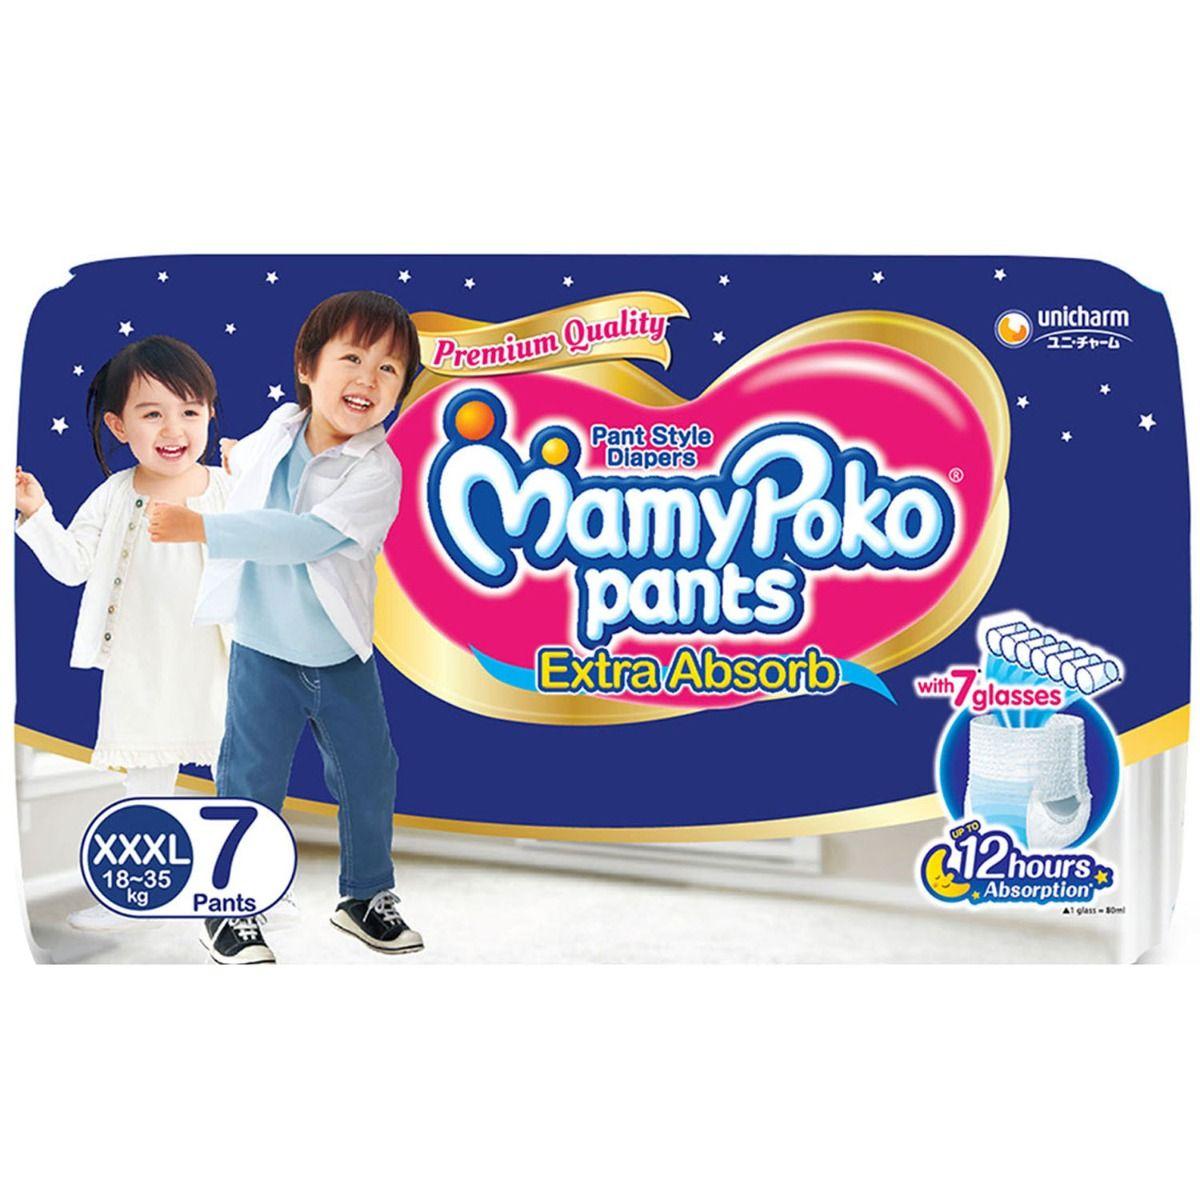 MamyPoko Extra Absorb Diaper Pants XXXL, 7 Count